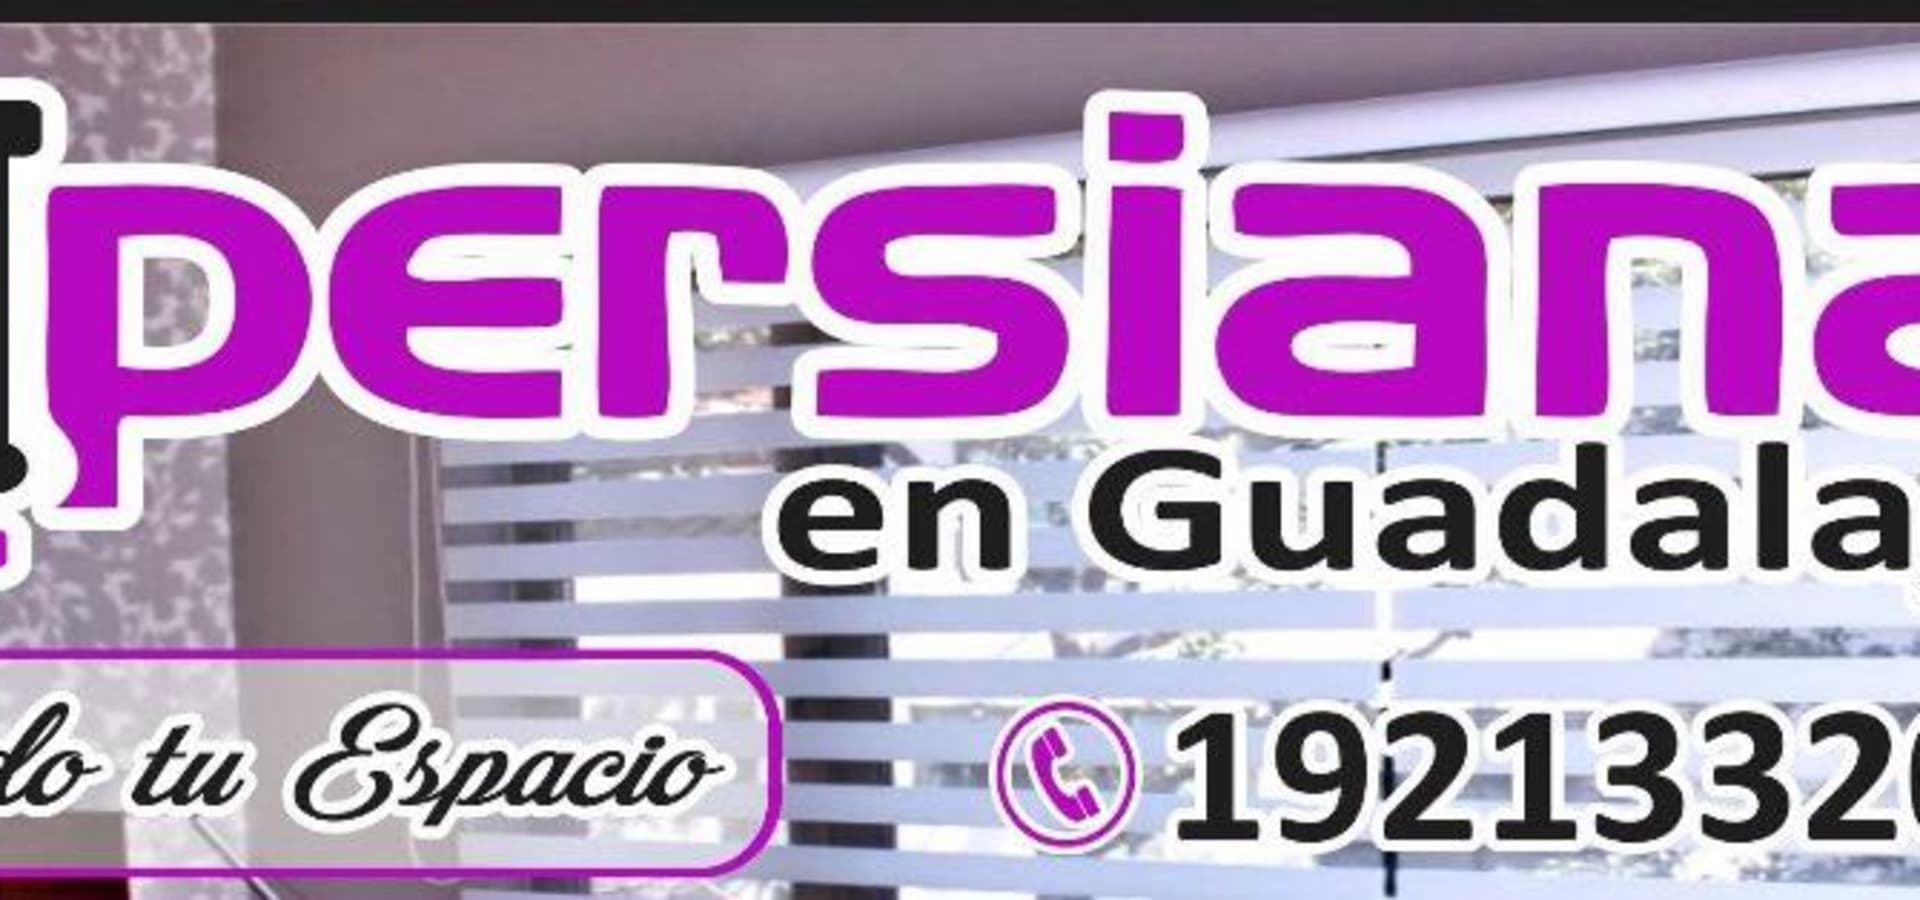 Persianas en Guadalajara Gdl